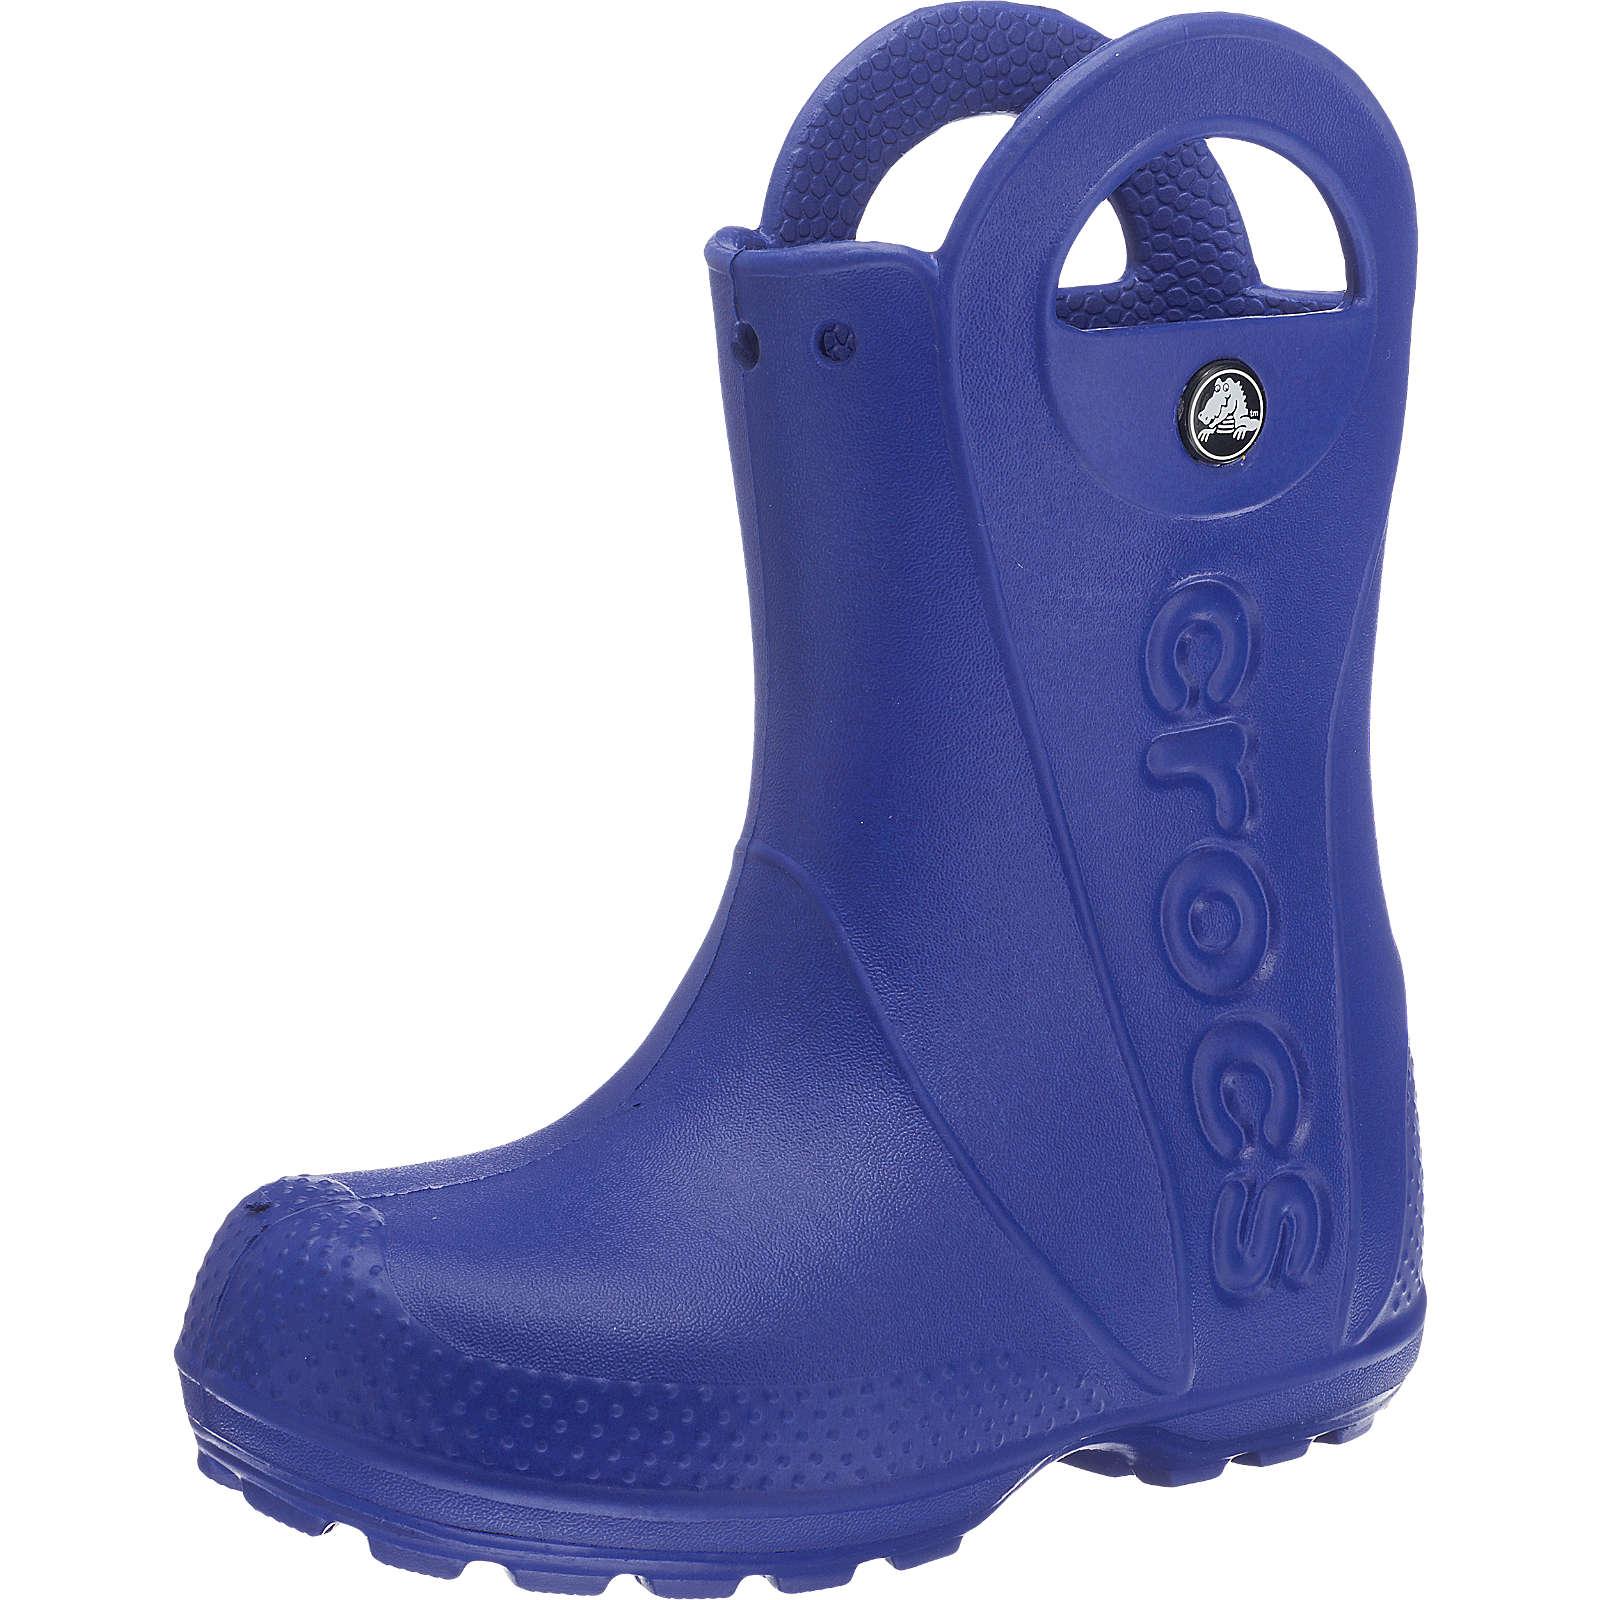 CROCS Kinder Gummistiefel Handle It Rain Boot blau Junge Gr. 32/33